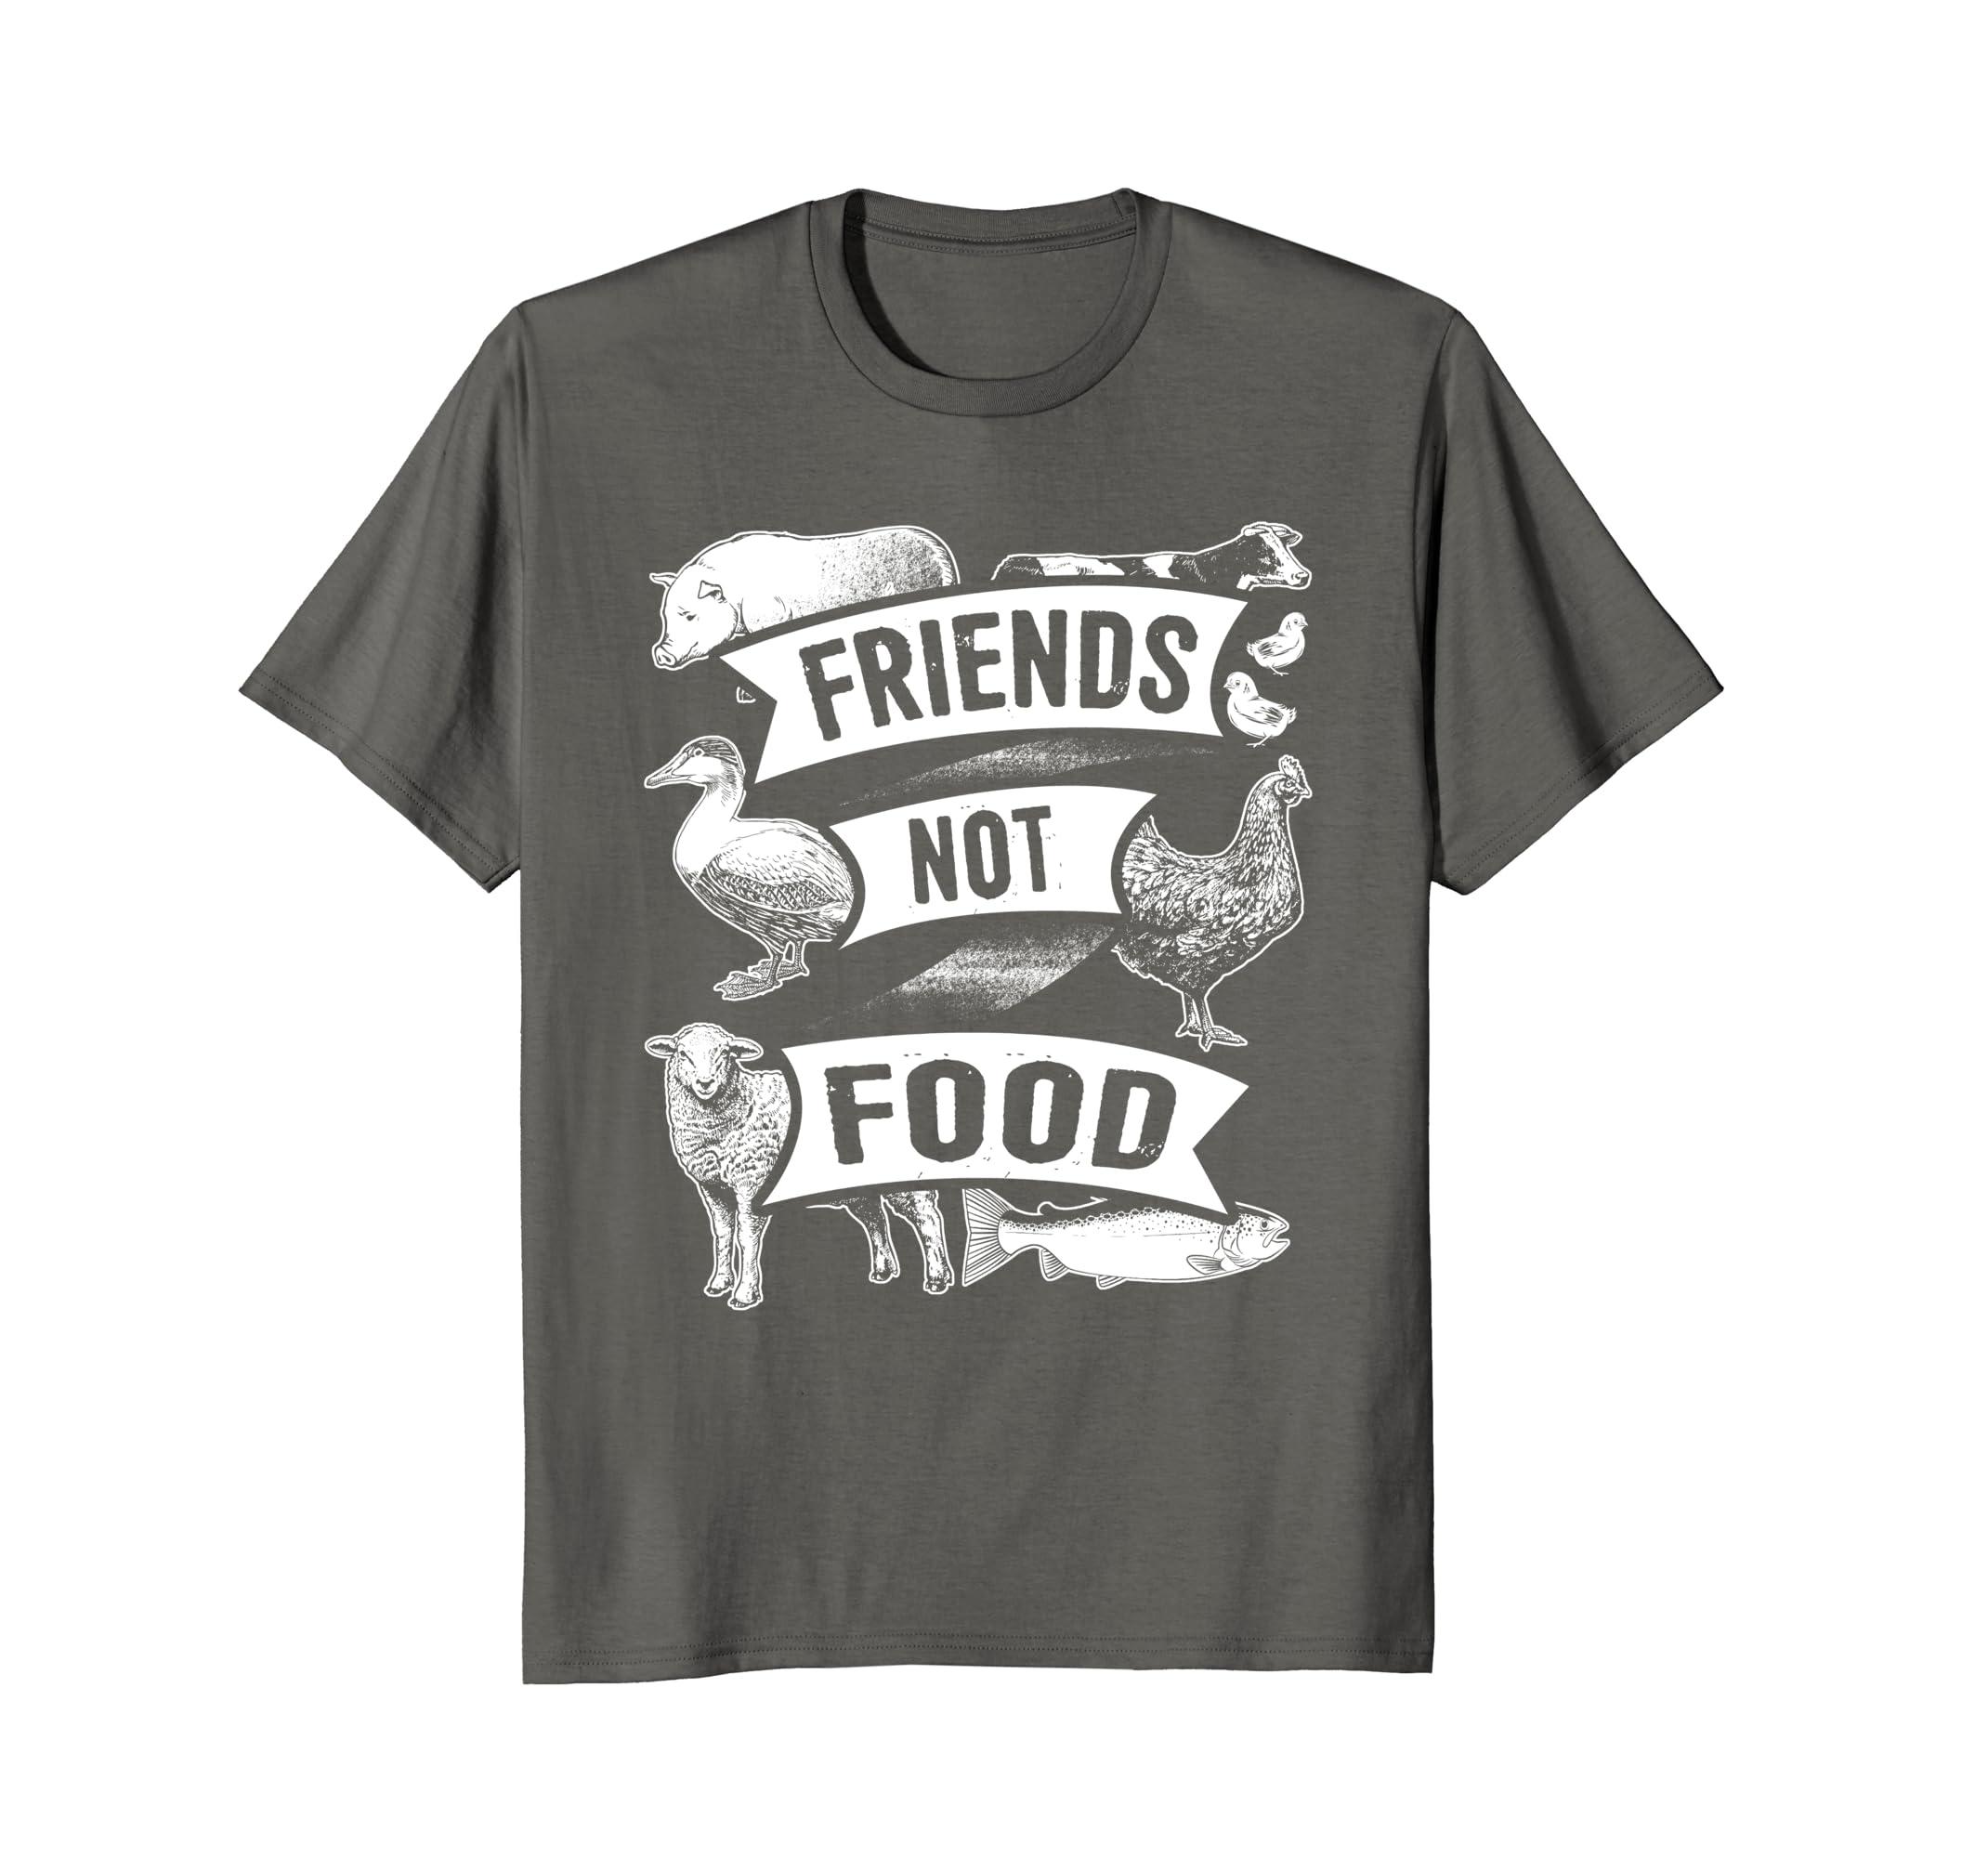 2d7843b6e Amazon.com: Friends Not Food T-Shirt Funny Vegetarian Vegan Apparel:  Clothing